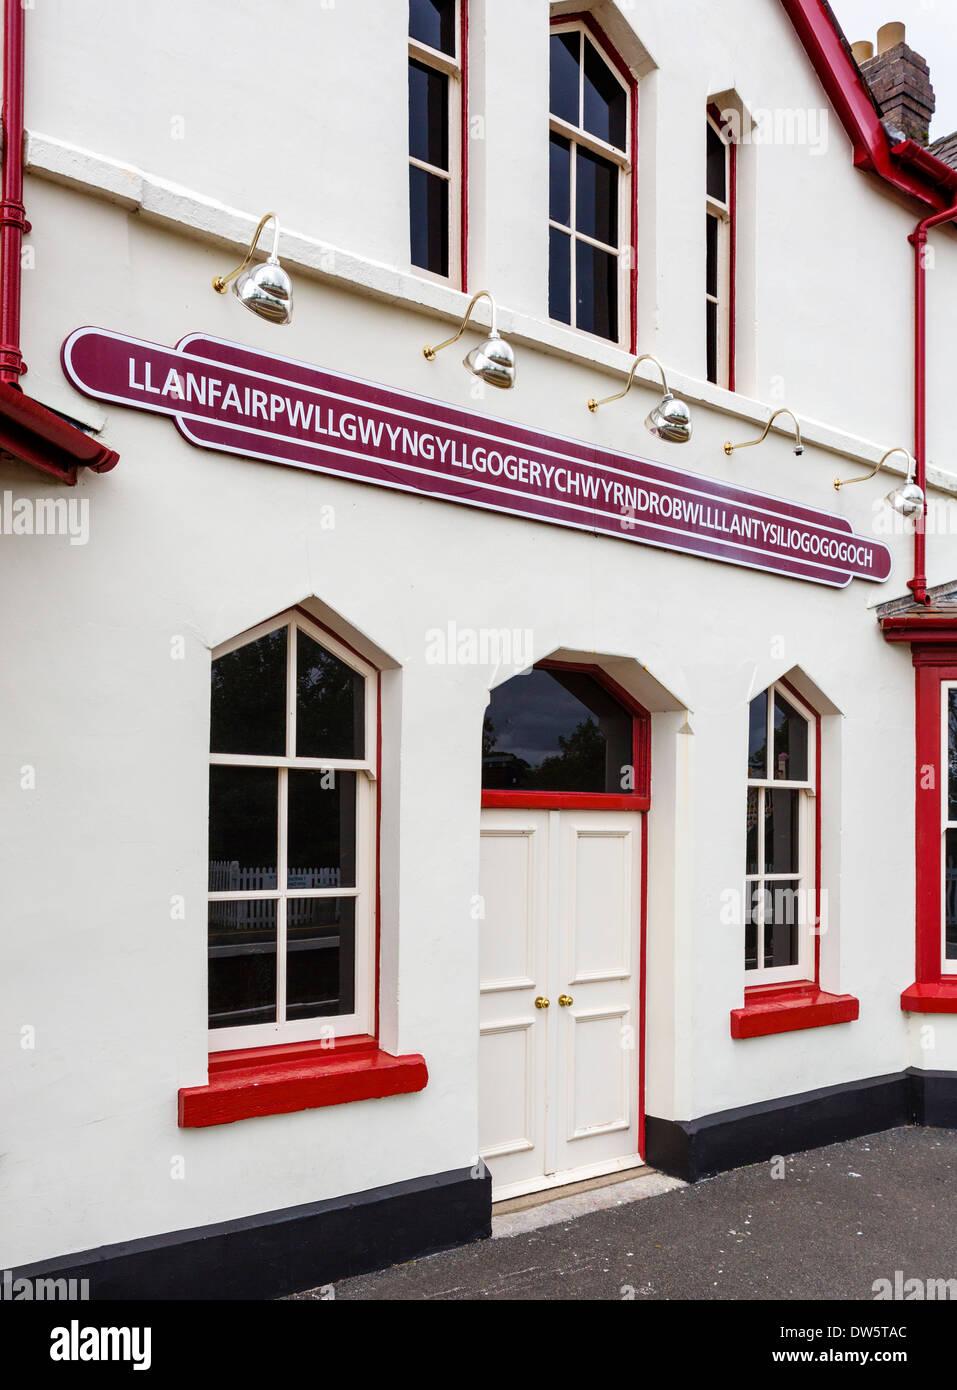 Station sign for longest place name in the UK, Llanfairpwllgwyngyllgogerychwyrndrobwllllantysiliogogogoch, Anglesey, - Stock Image